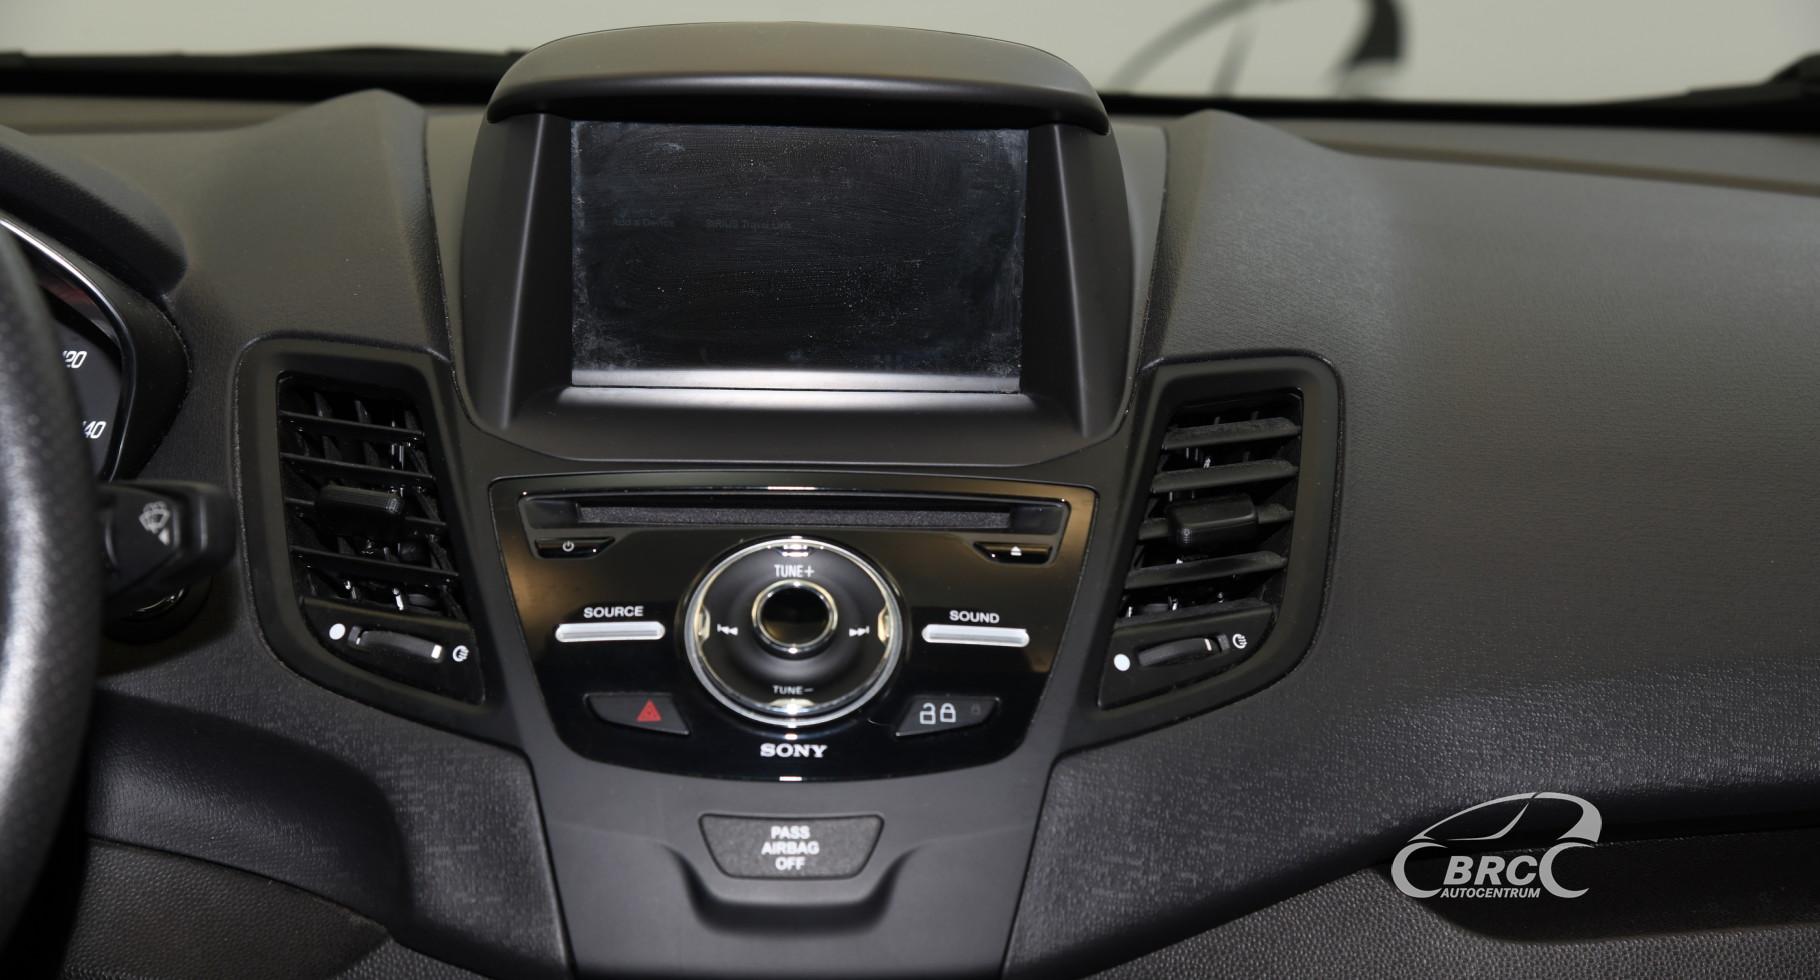 Ford Fiesta ST 1.6 EcoBoost SCTi